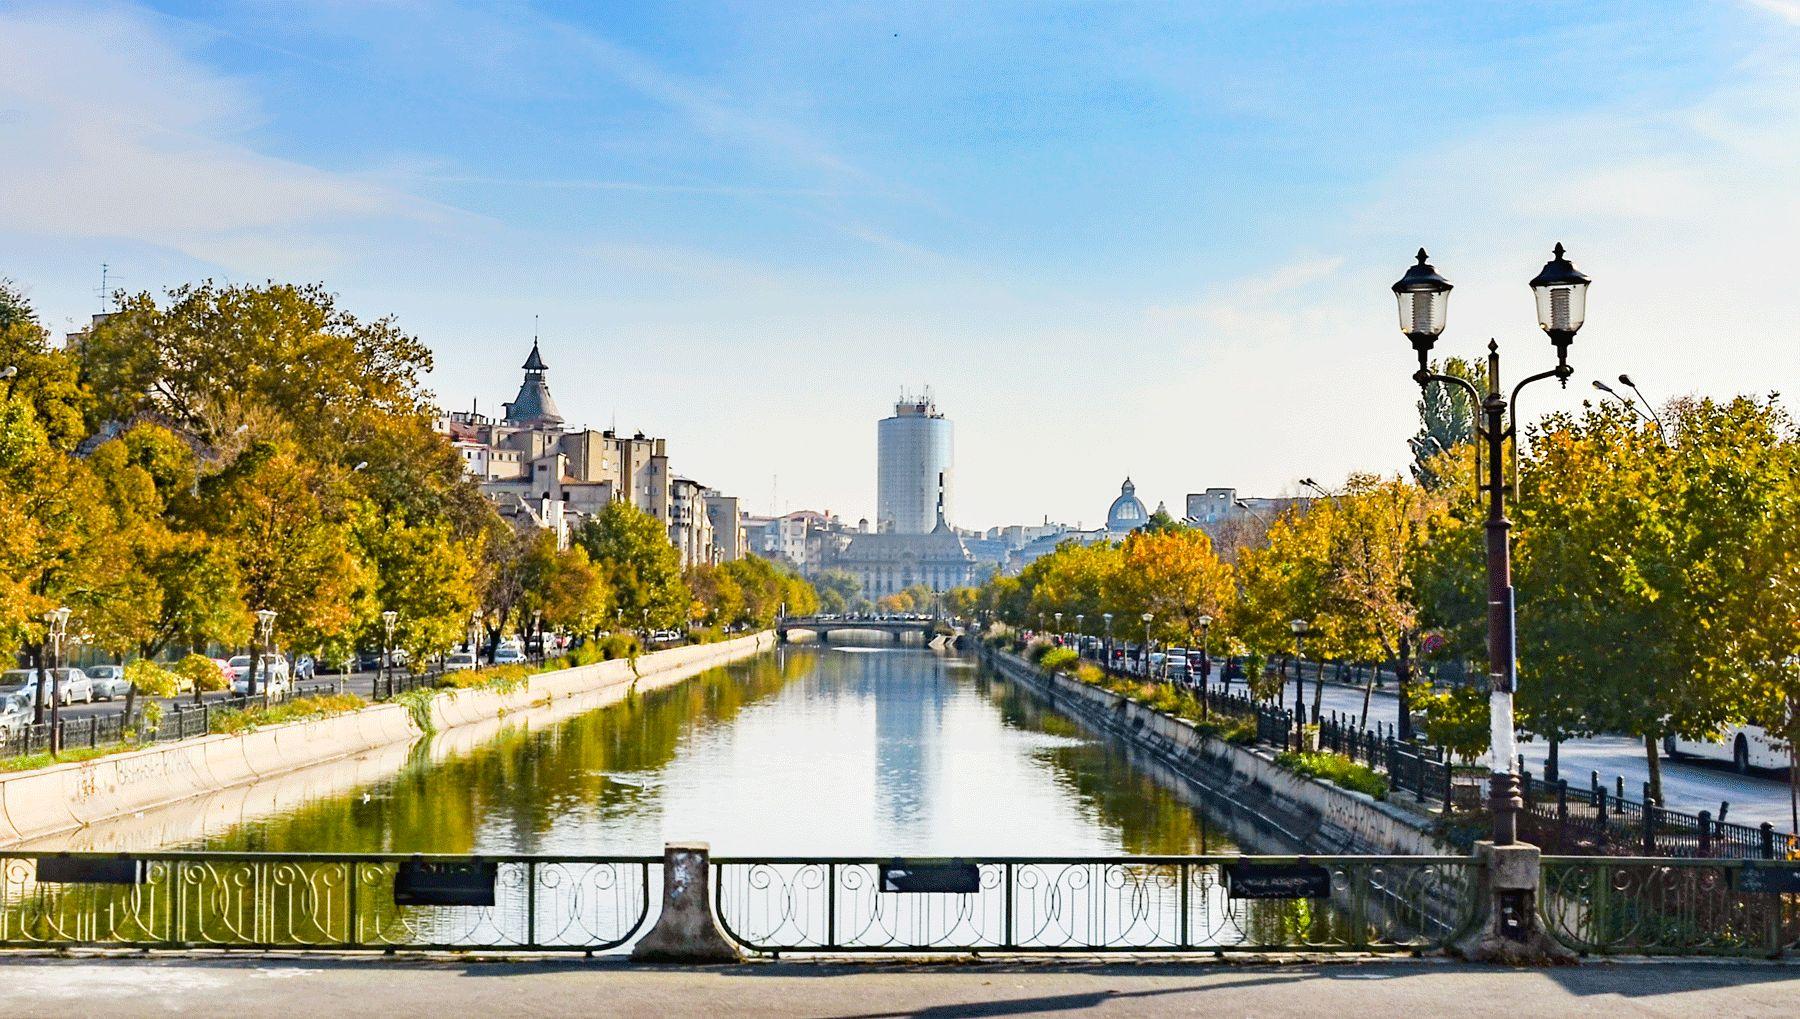 Bukarest iStock 496483128 web